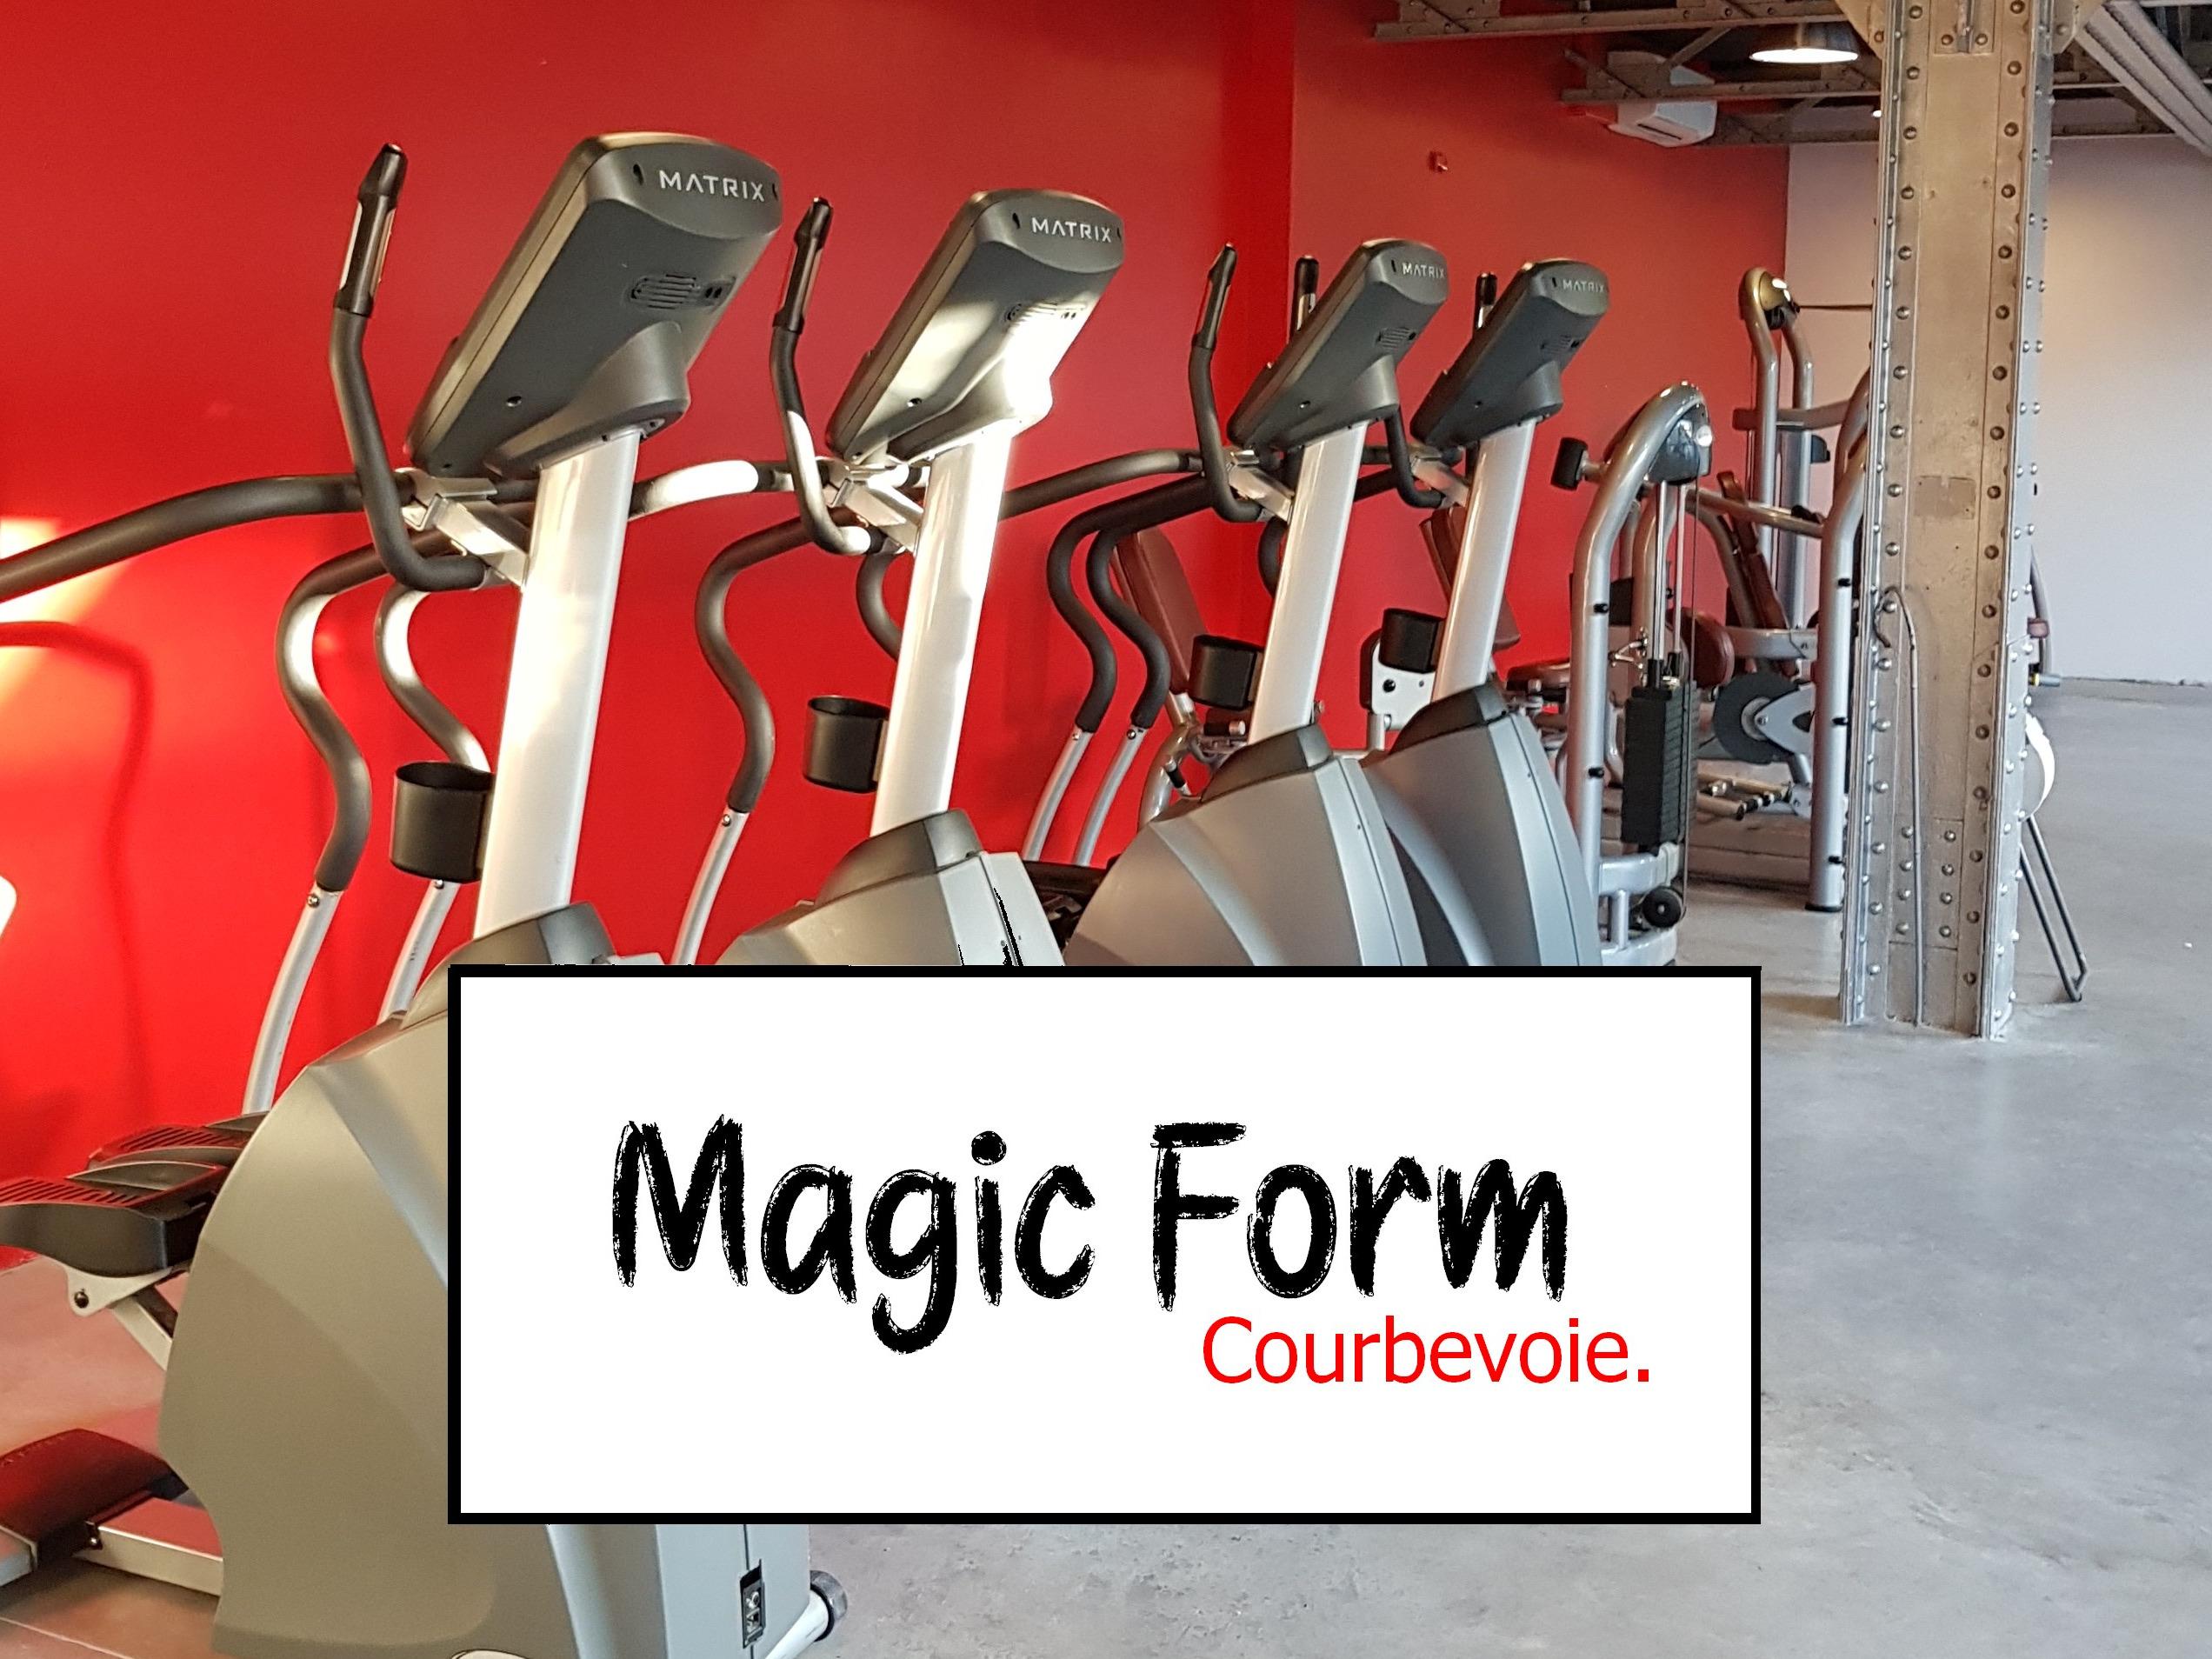 Magic Form Courbevoie